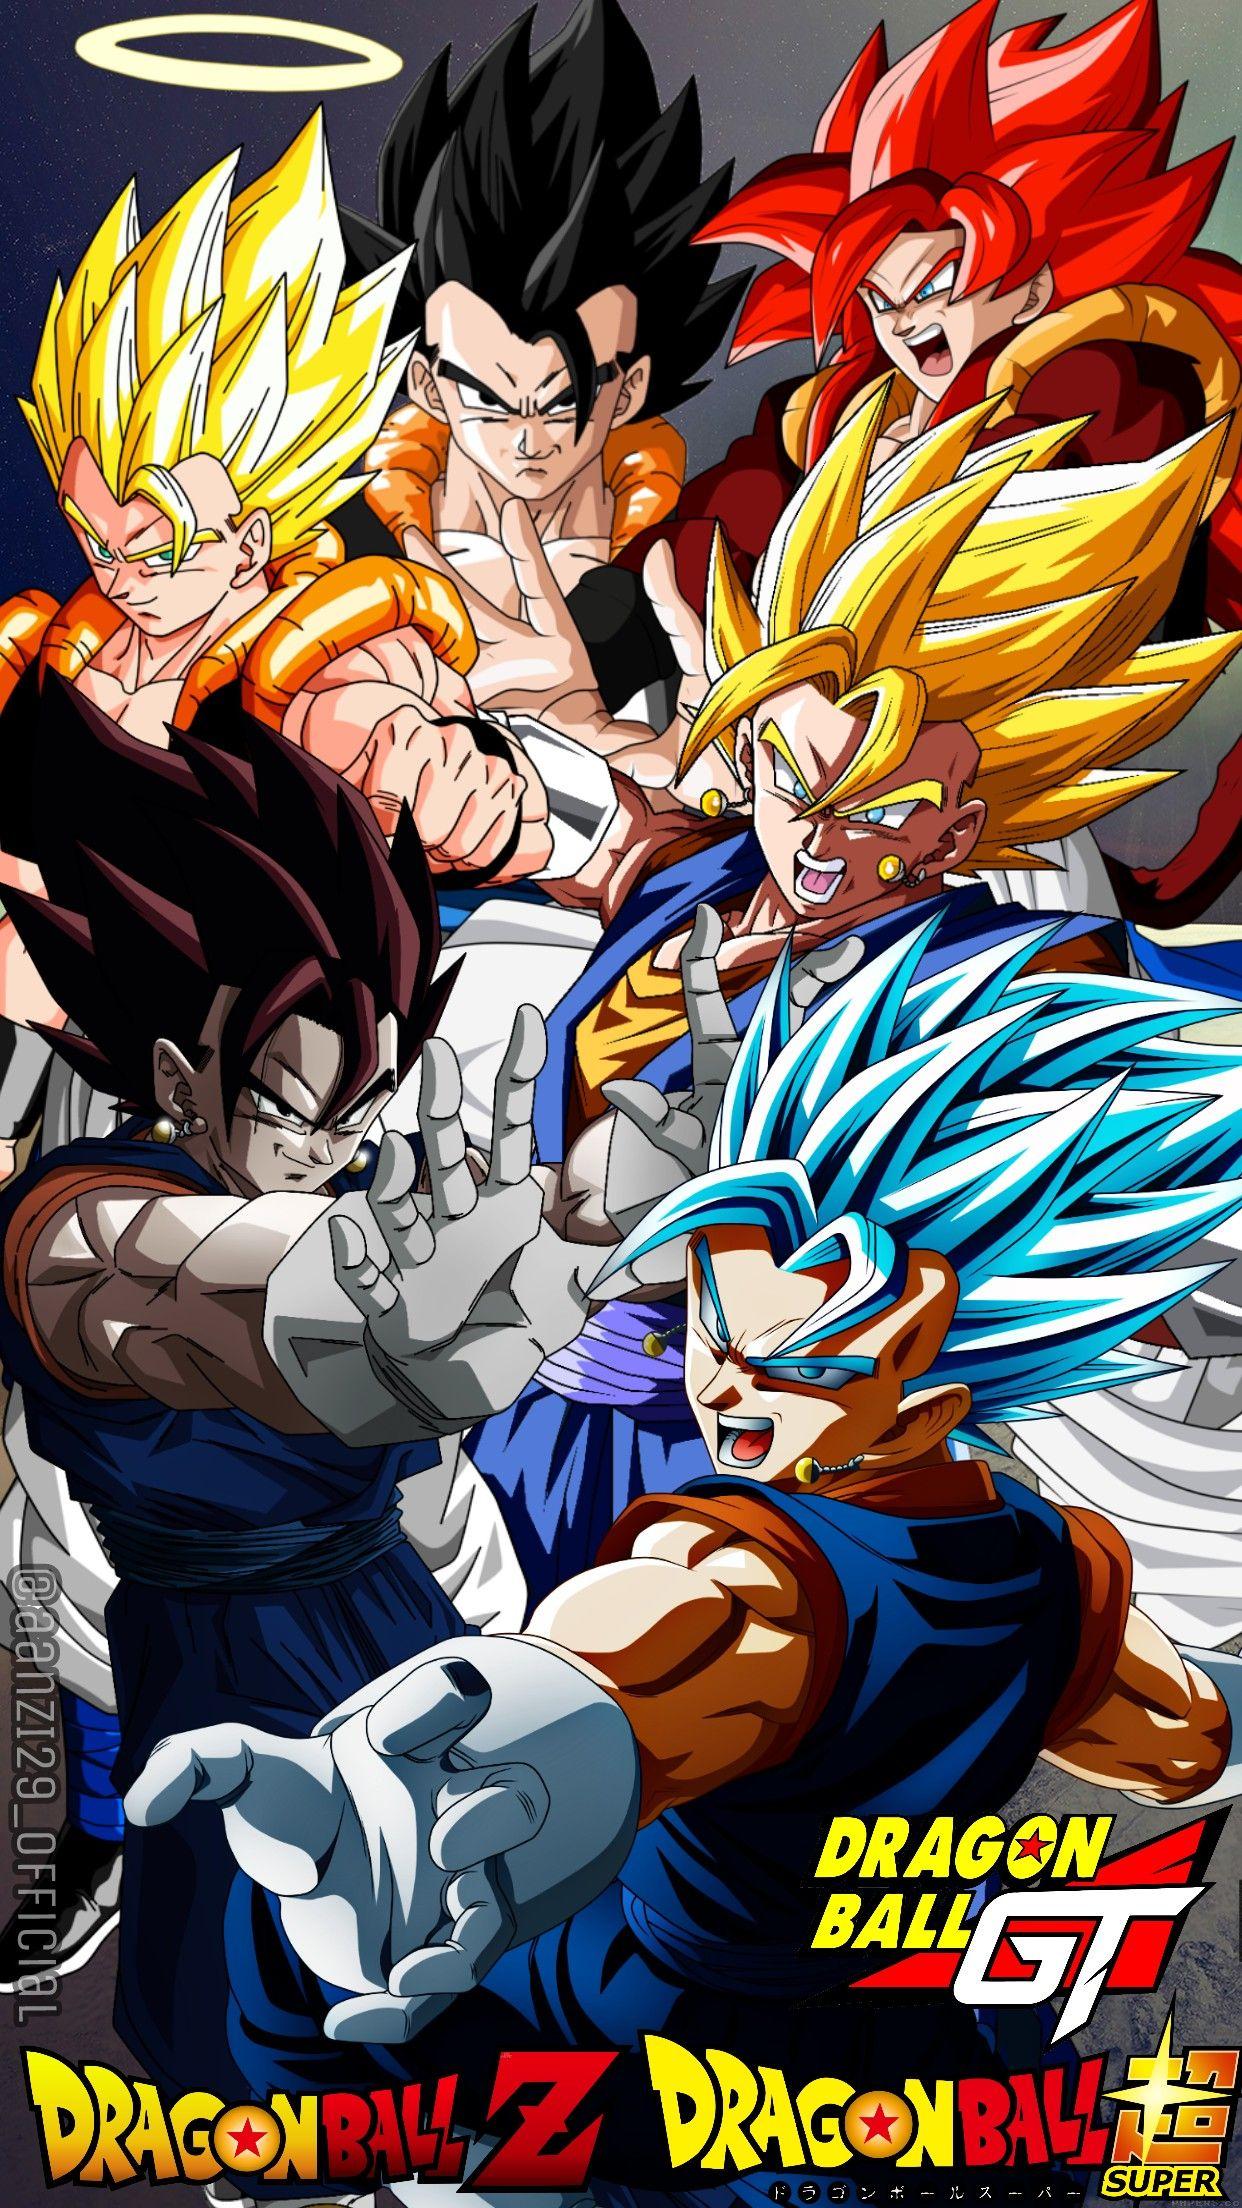 The Fusion - Gogeta - Vegito - Dragon Ball by AlAnas2992 on DeviantArt